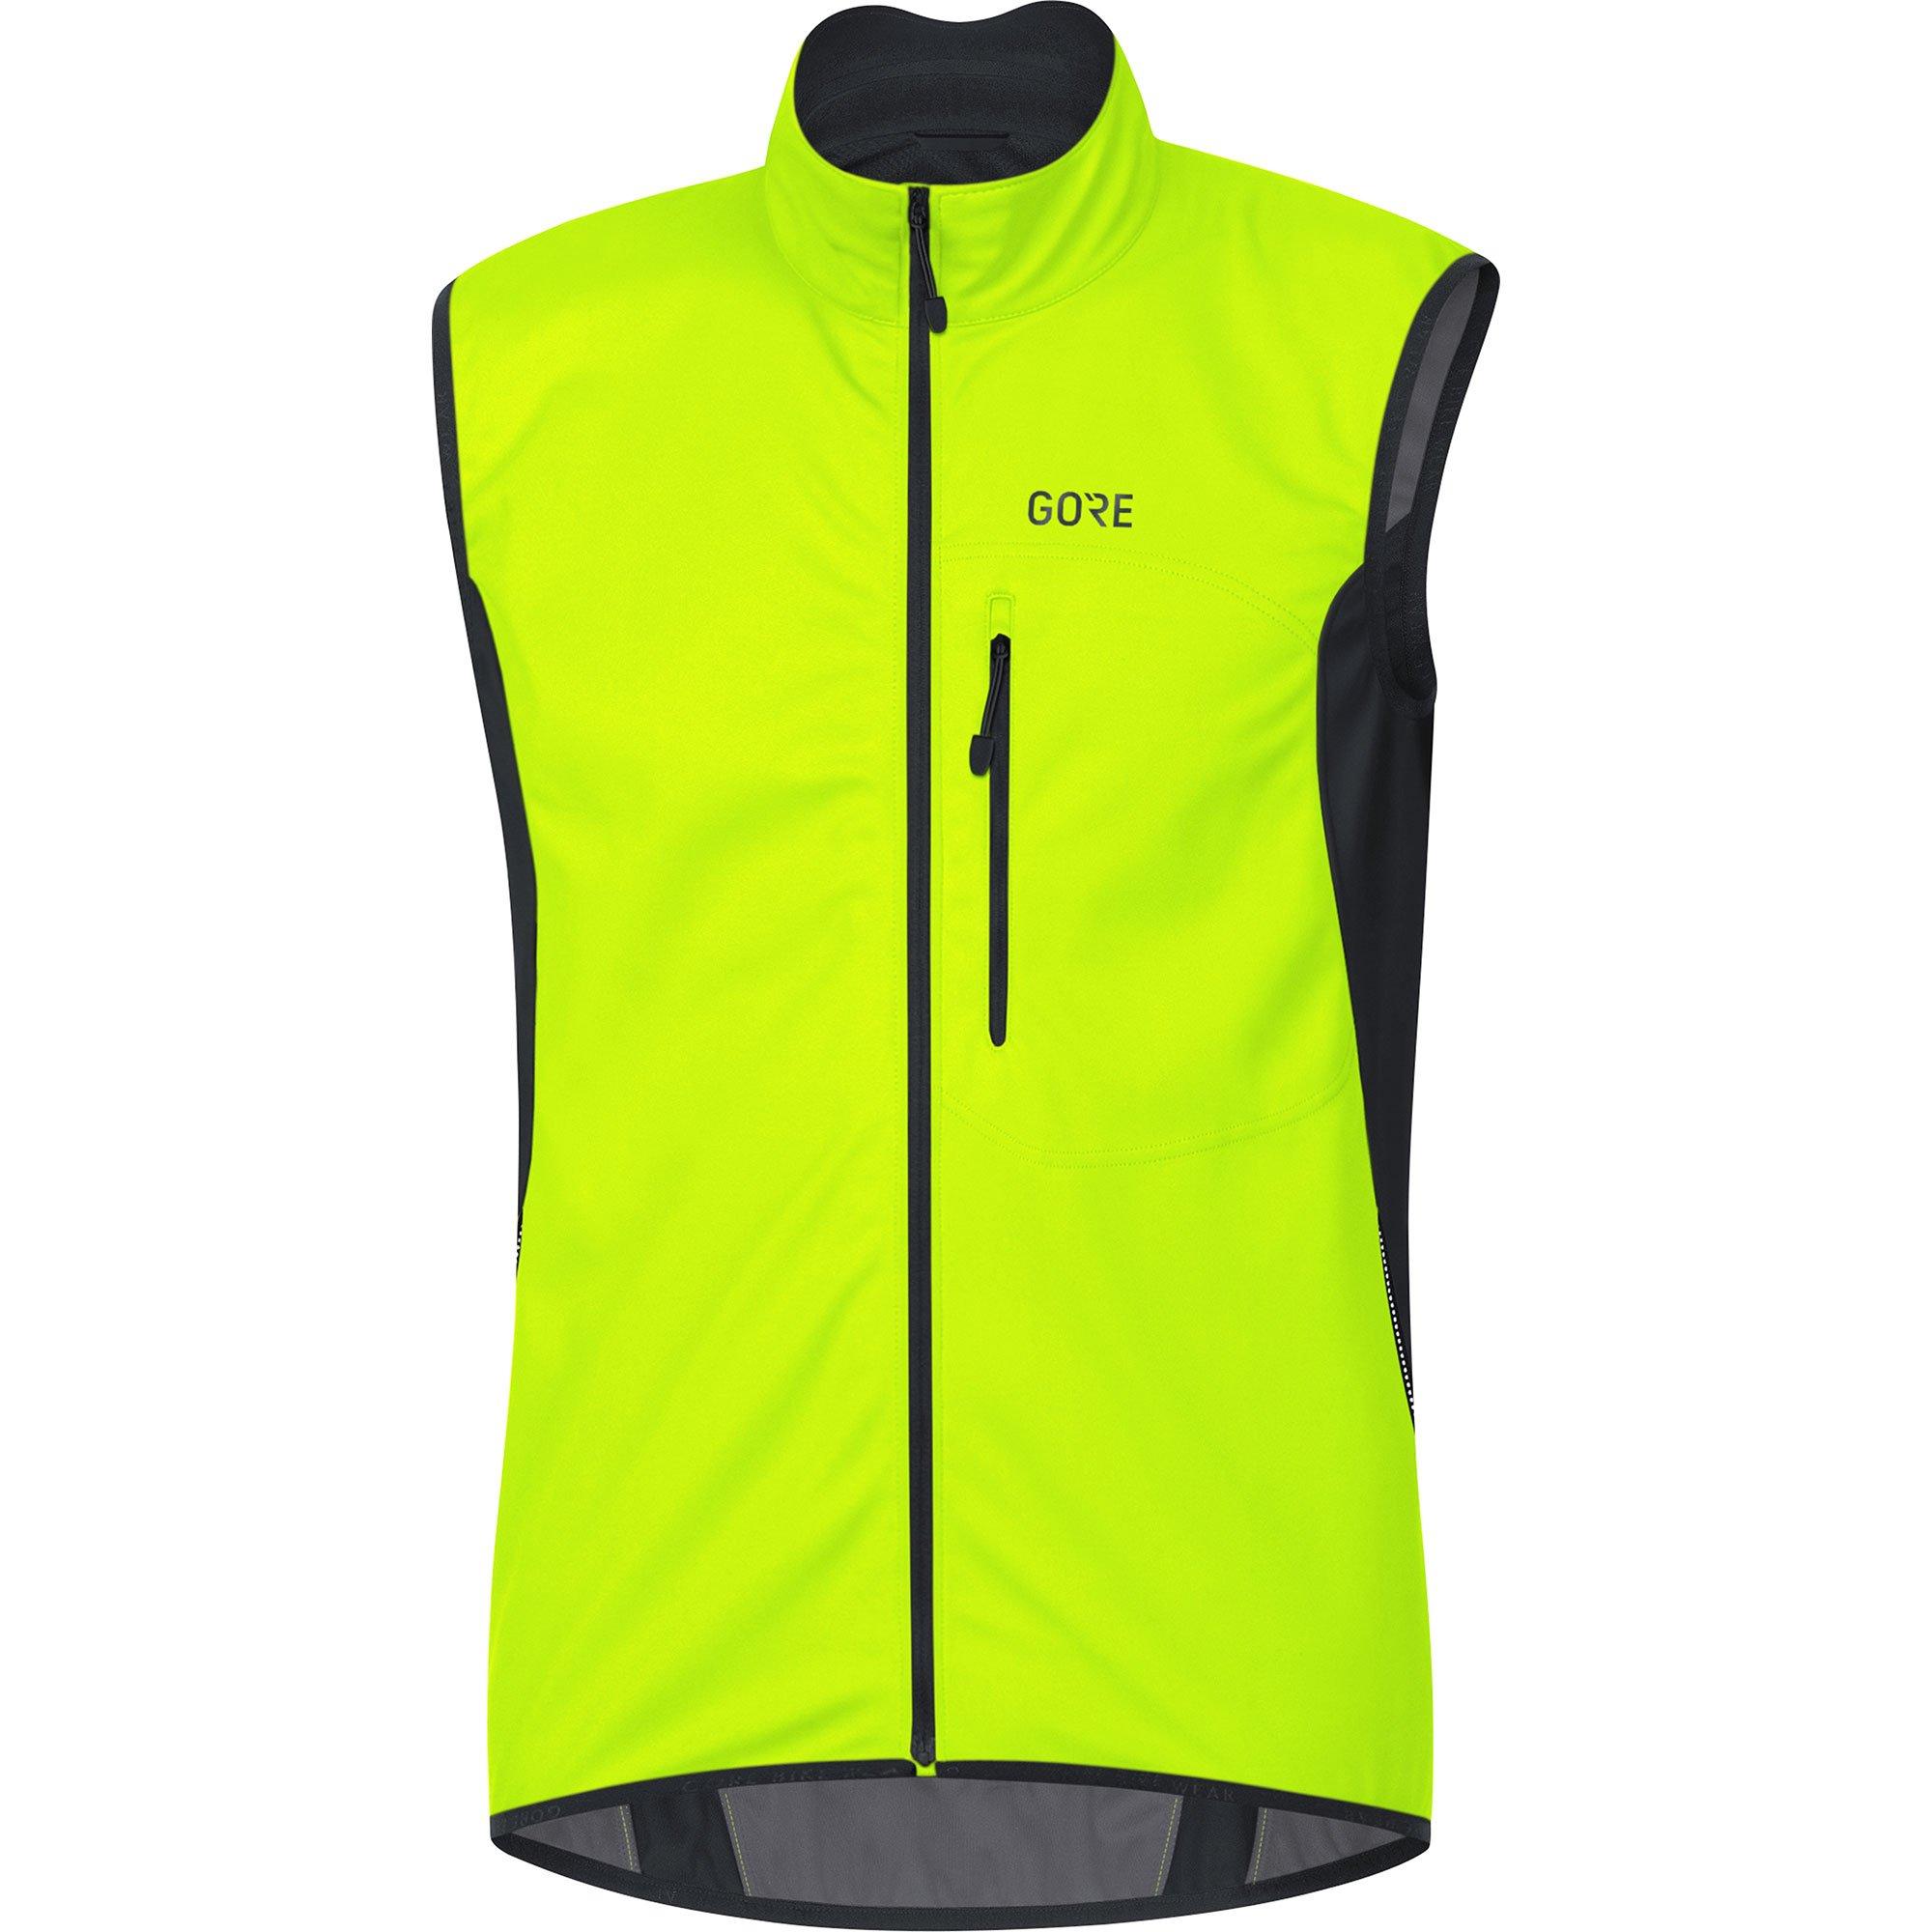 Gore Men's C3 Gws Vest,  neon yellow/black,  L by GORE WEAR